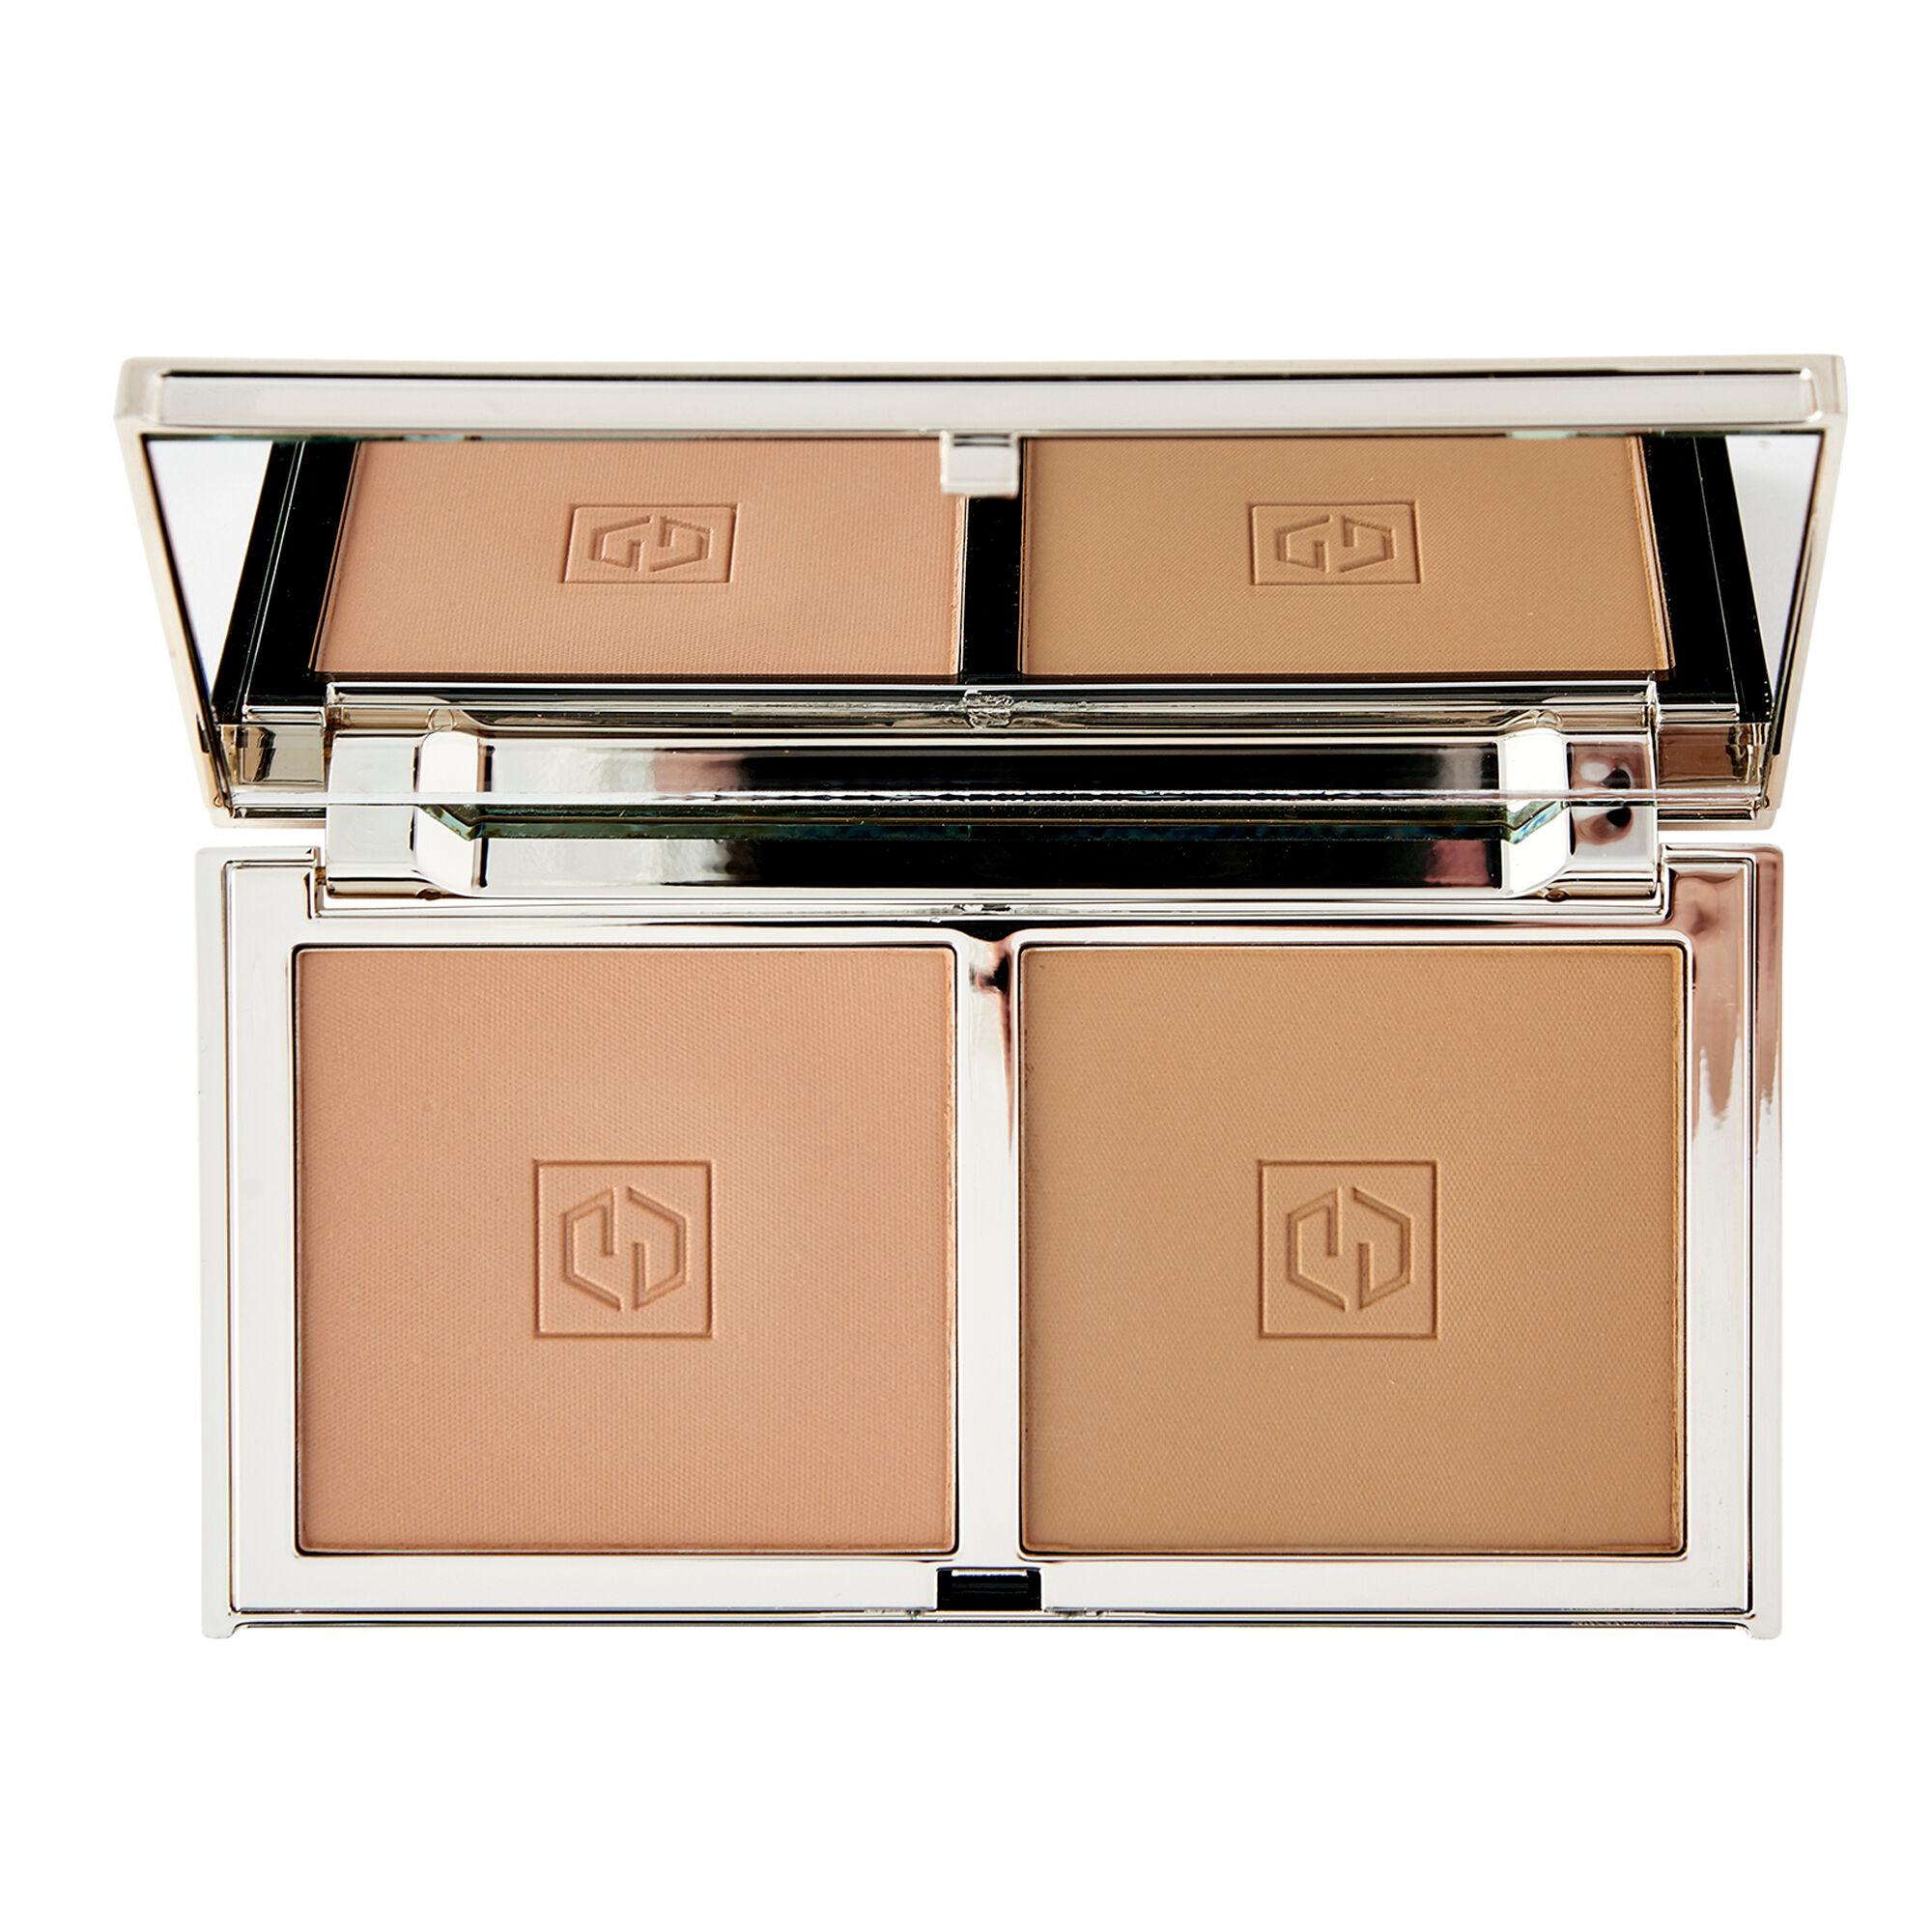 Jouer Cosmetics Sunswept Bronzer Duo Sunkissed 11g